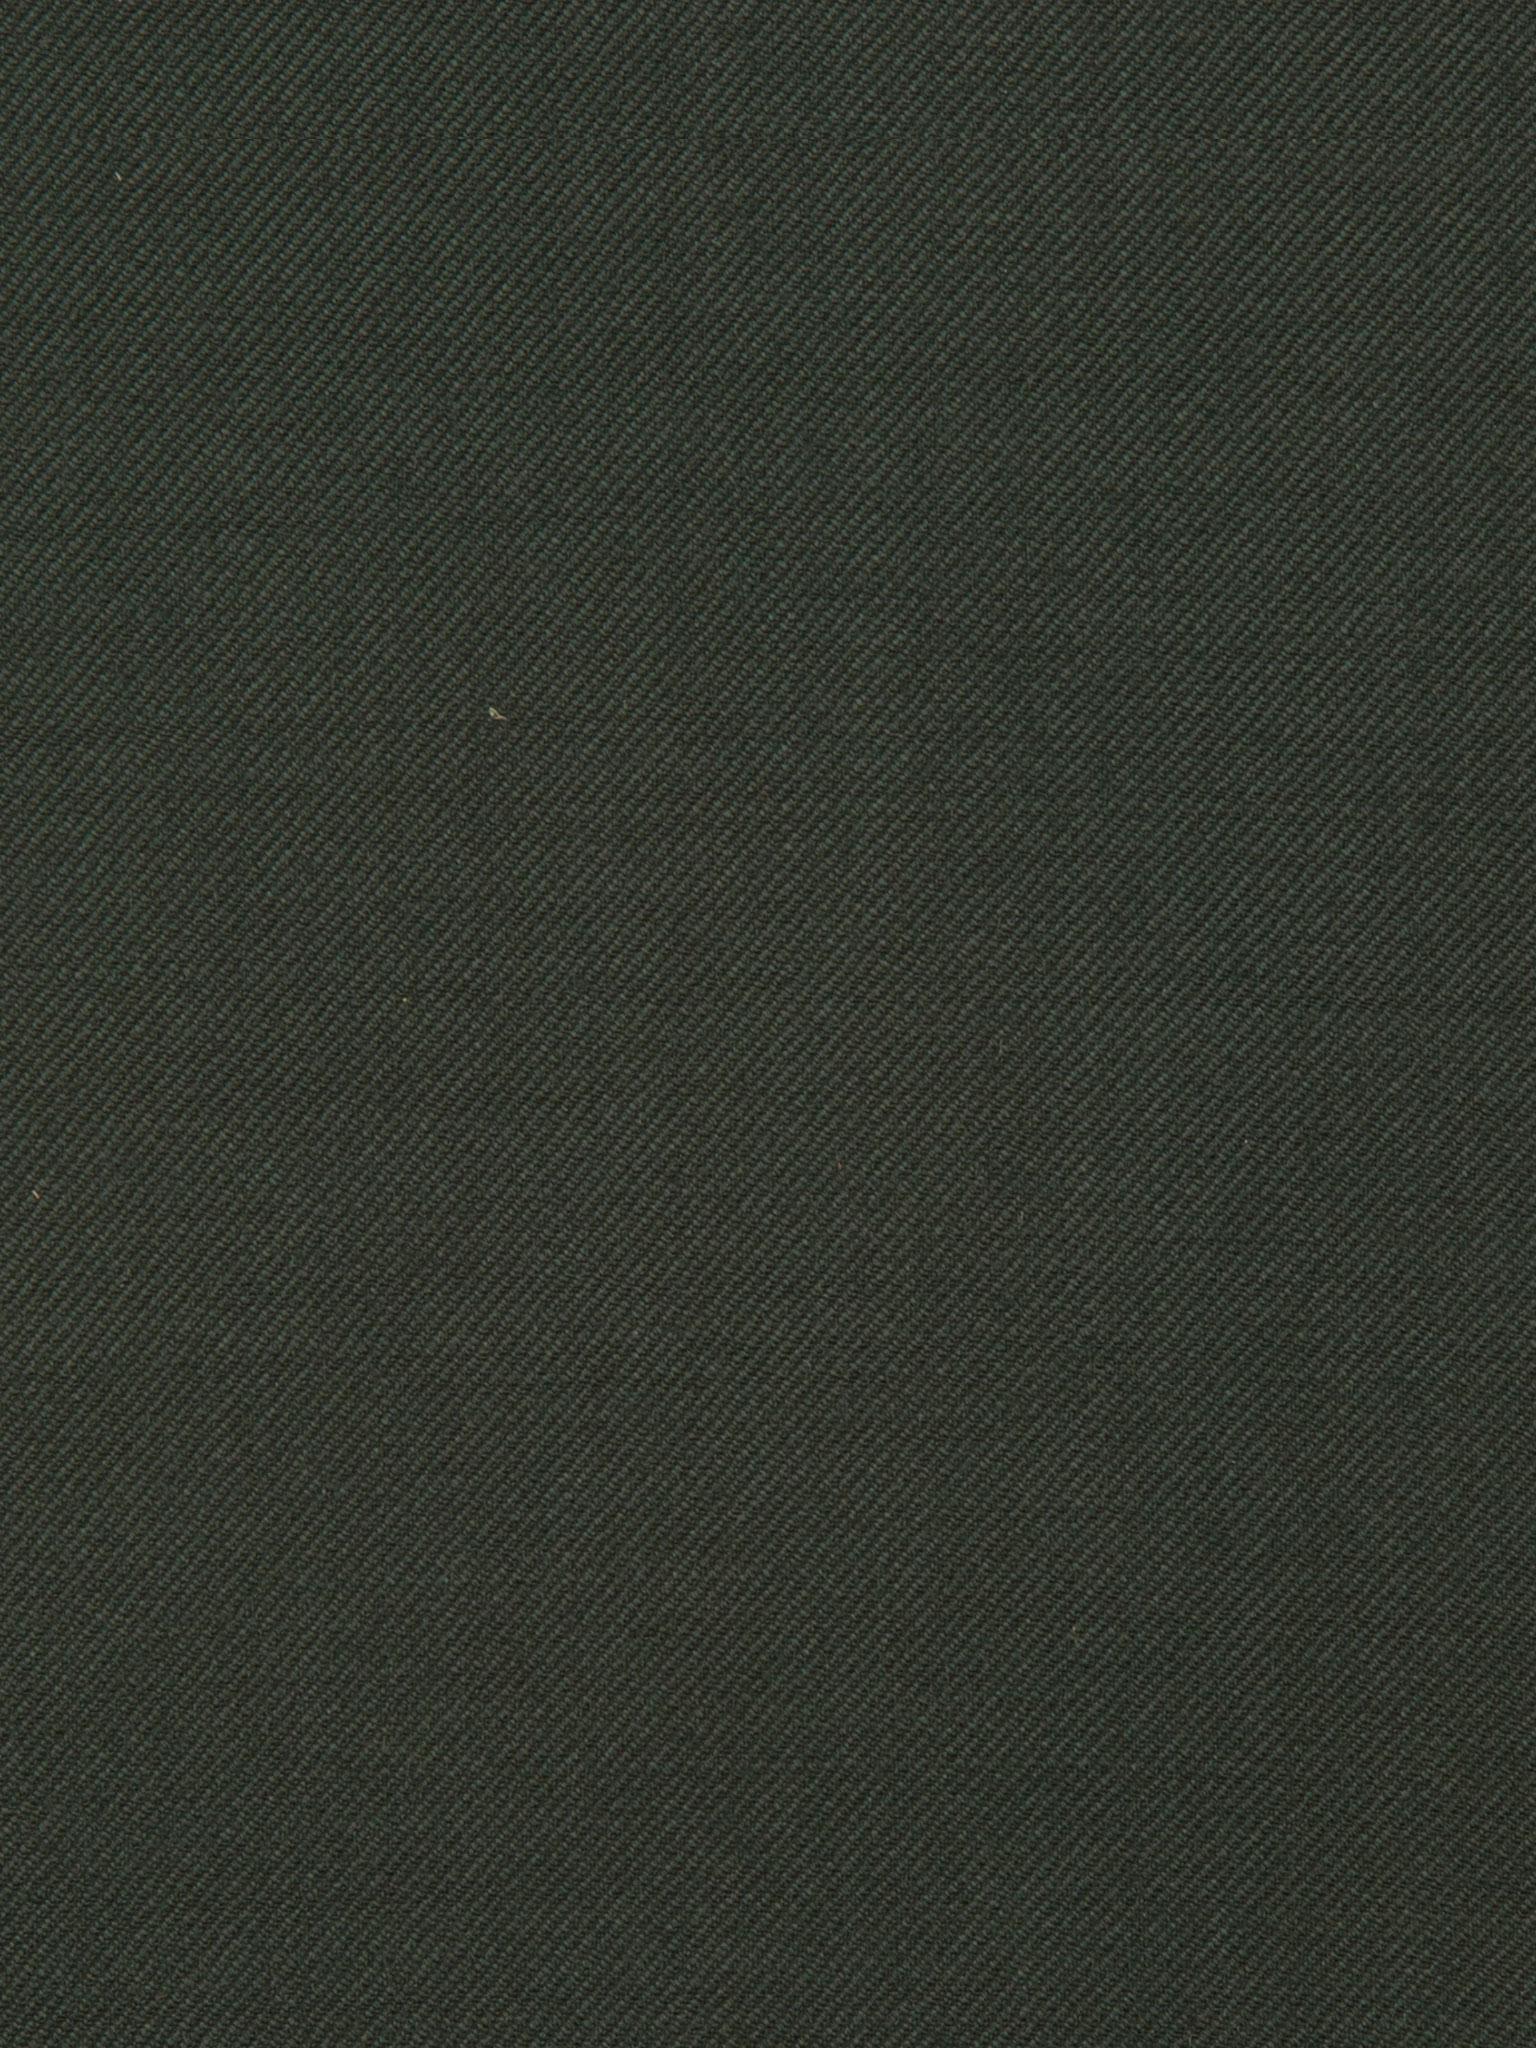 290008